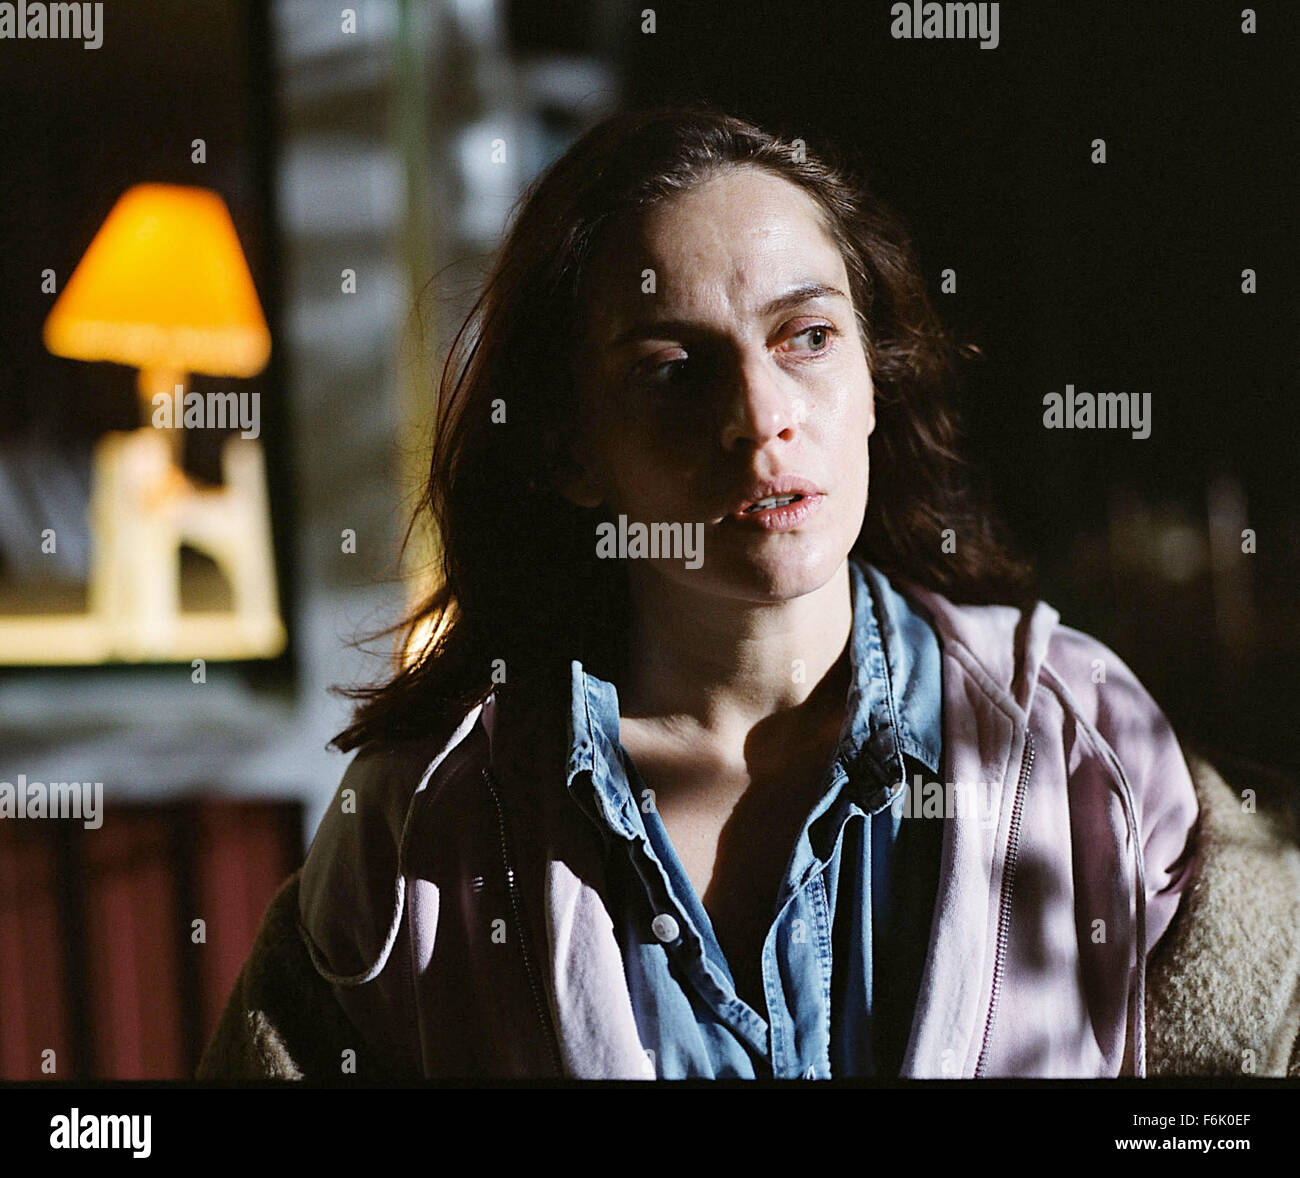 Amanda Ooms release date: 2005. movie title: harry's daughter. studio